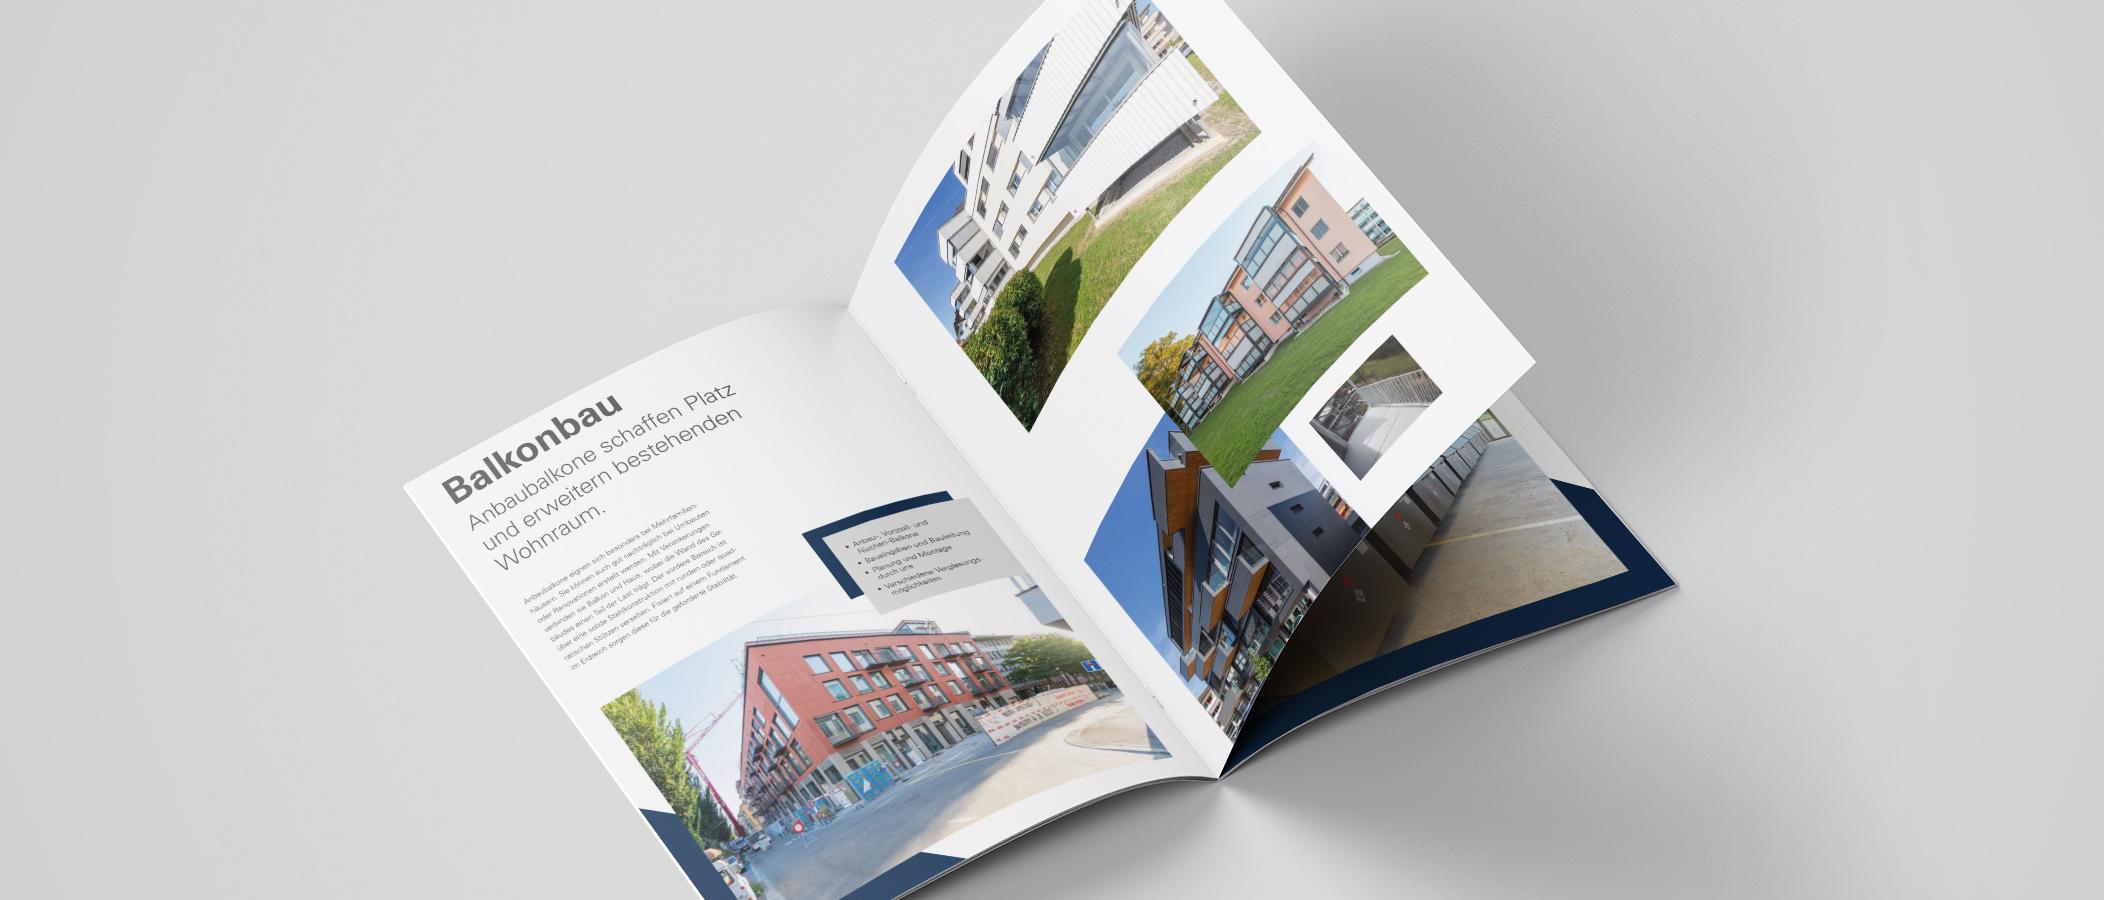 05_Vettiger_A4_Brochure_Mockup_7